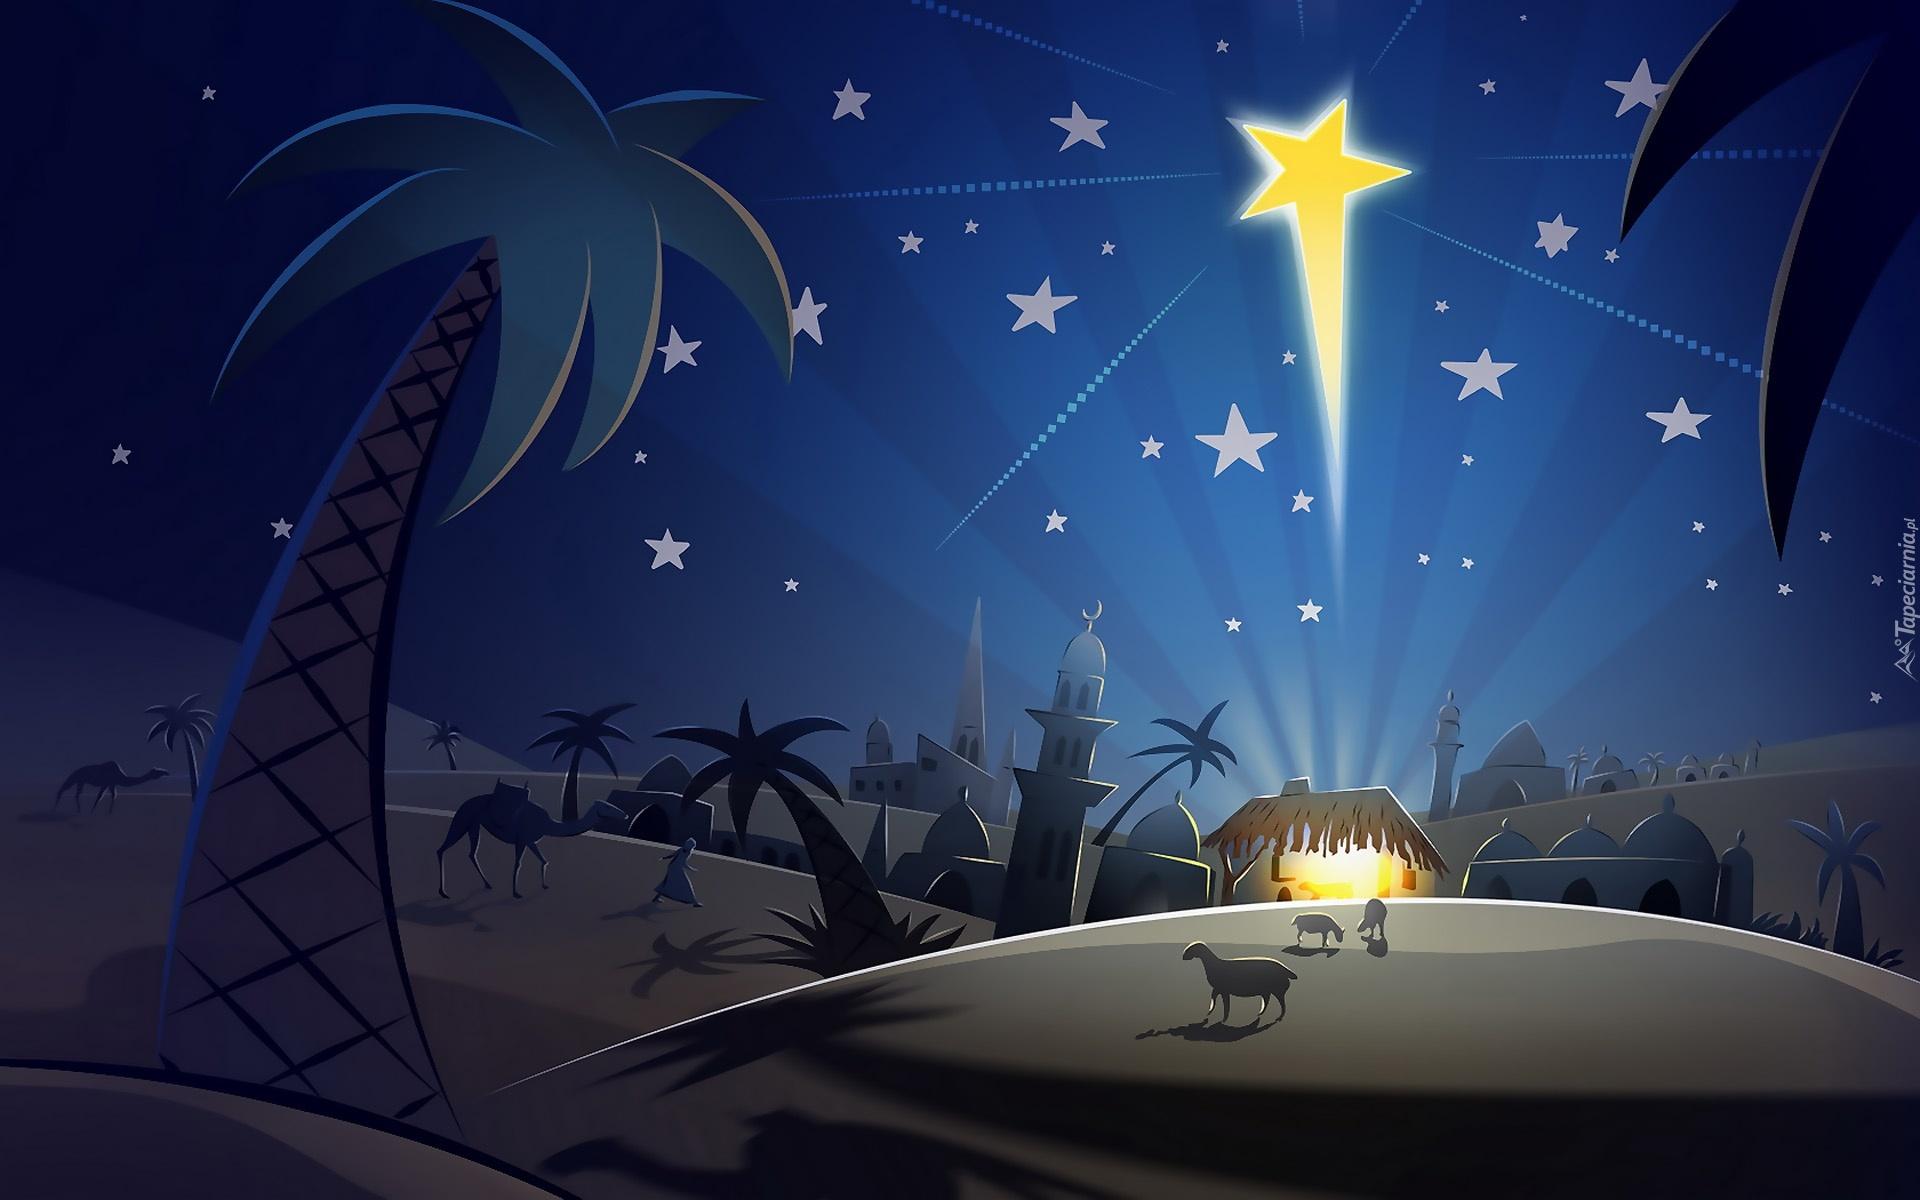 Gwiazda Betlejemska